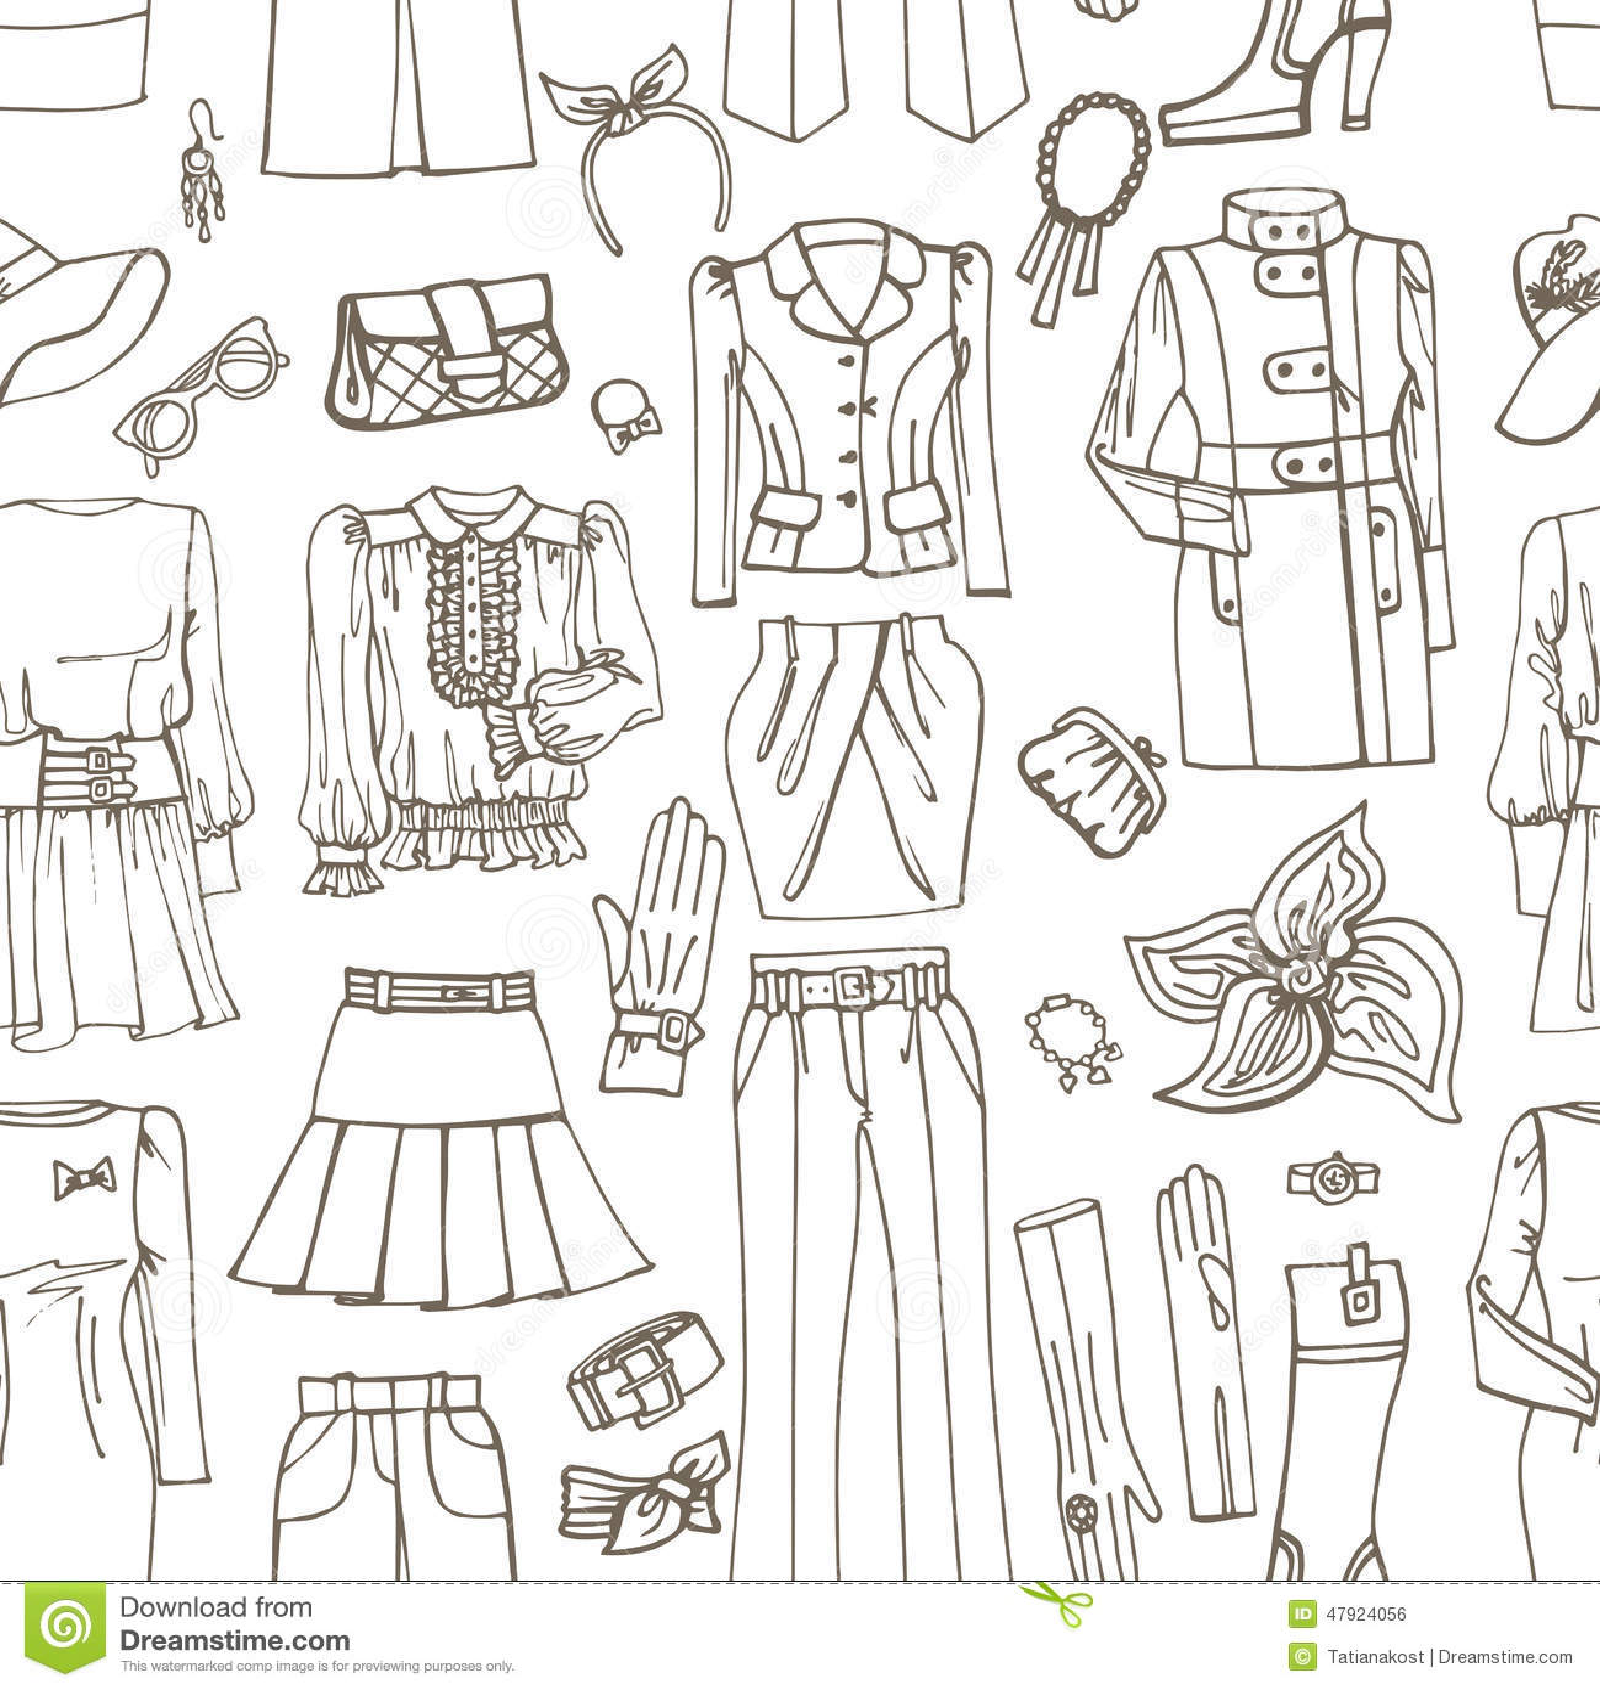 Entwurfs Skizze Frauen Kleidung Zubehor Vektor Abbildung